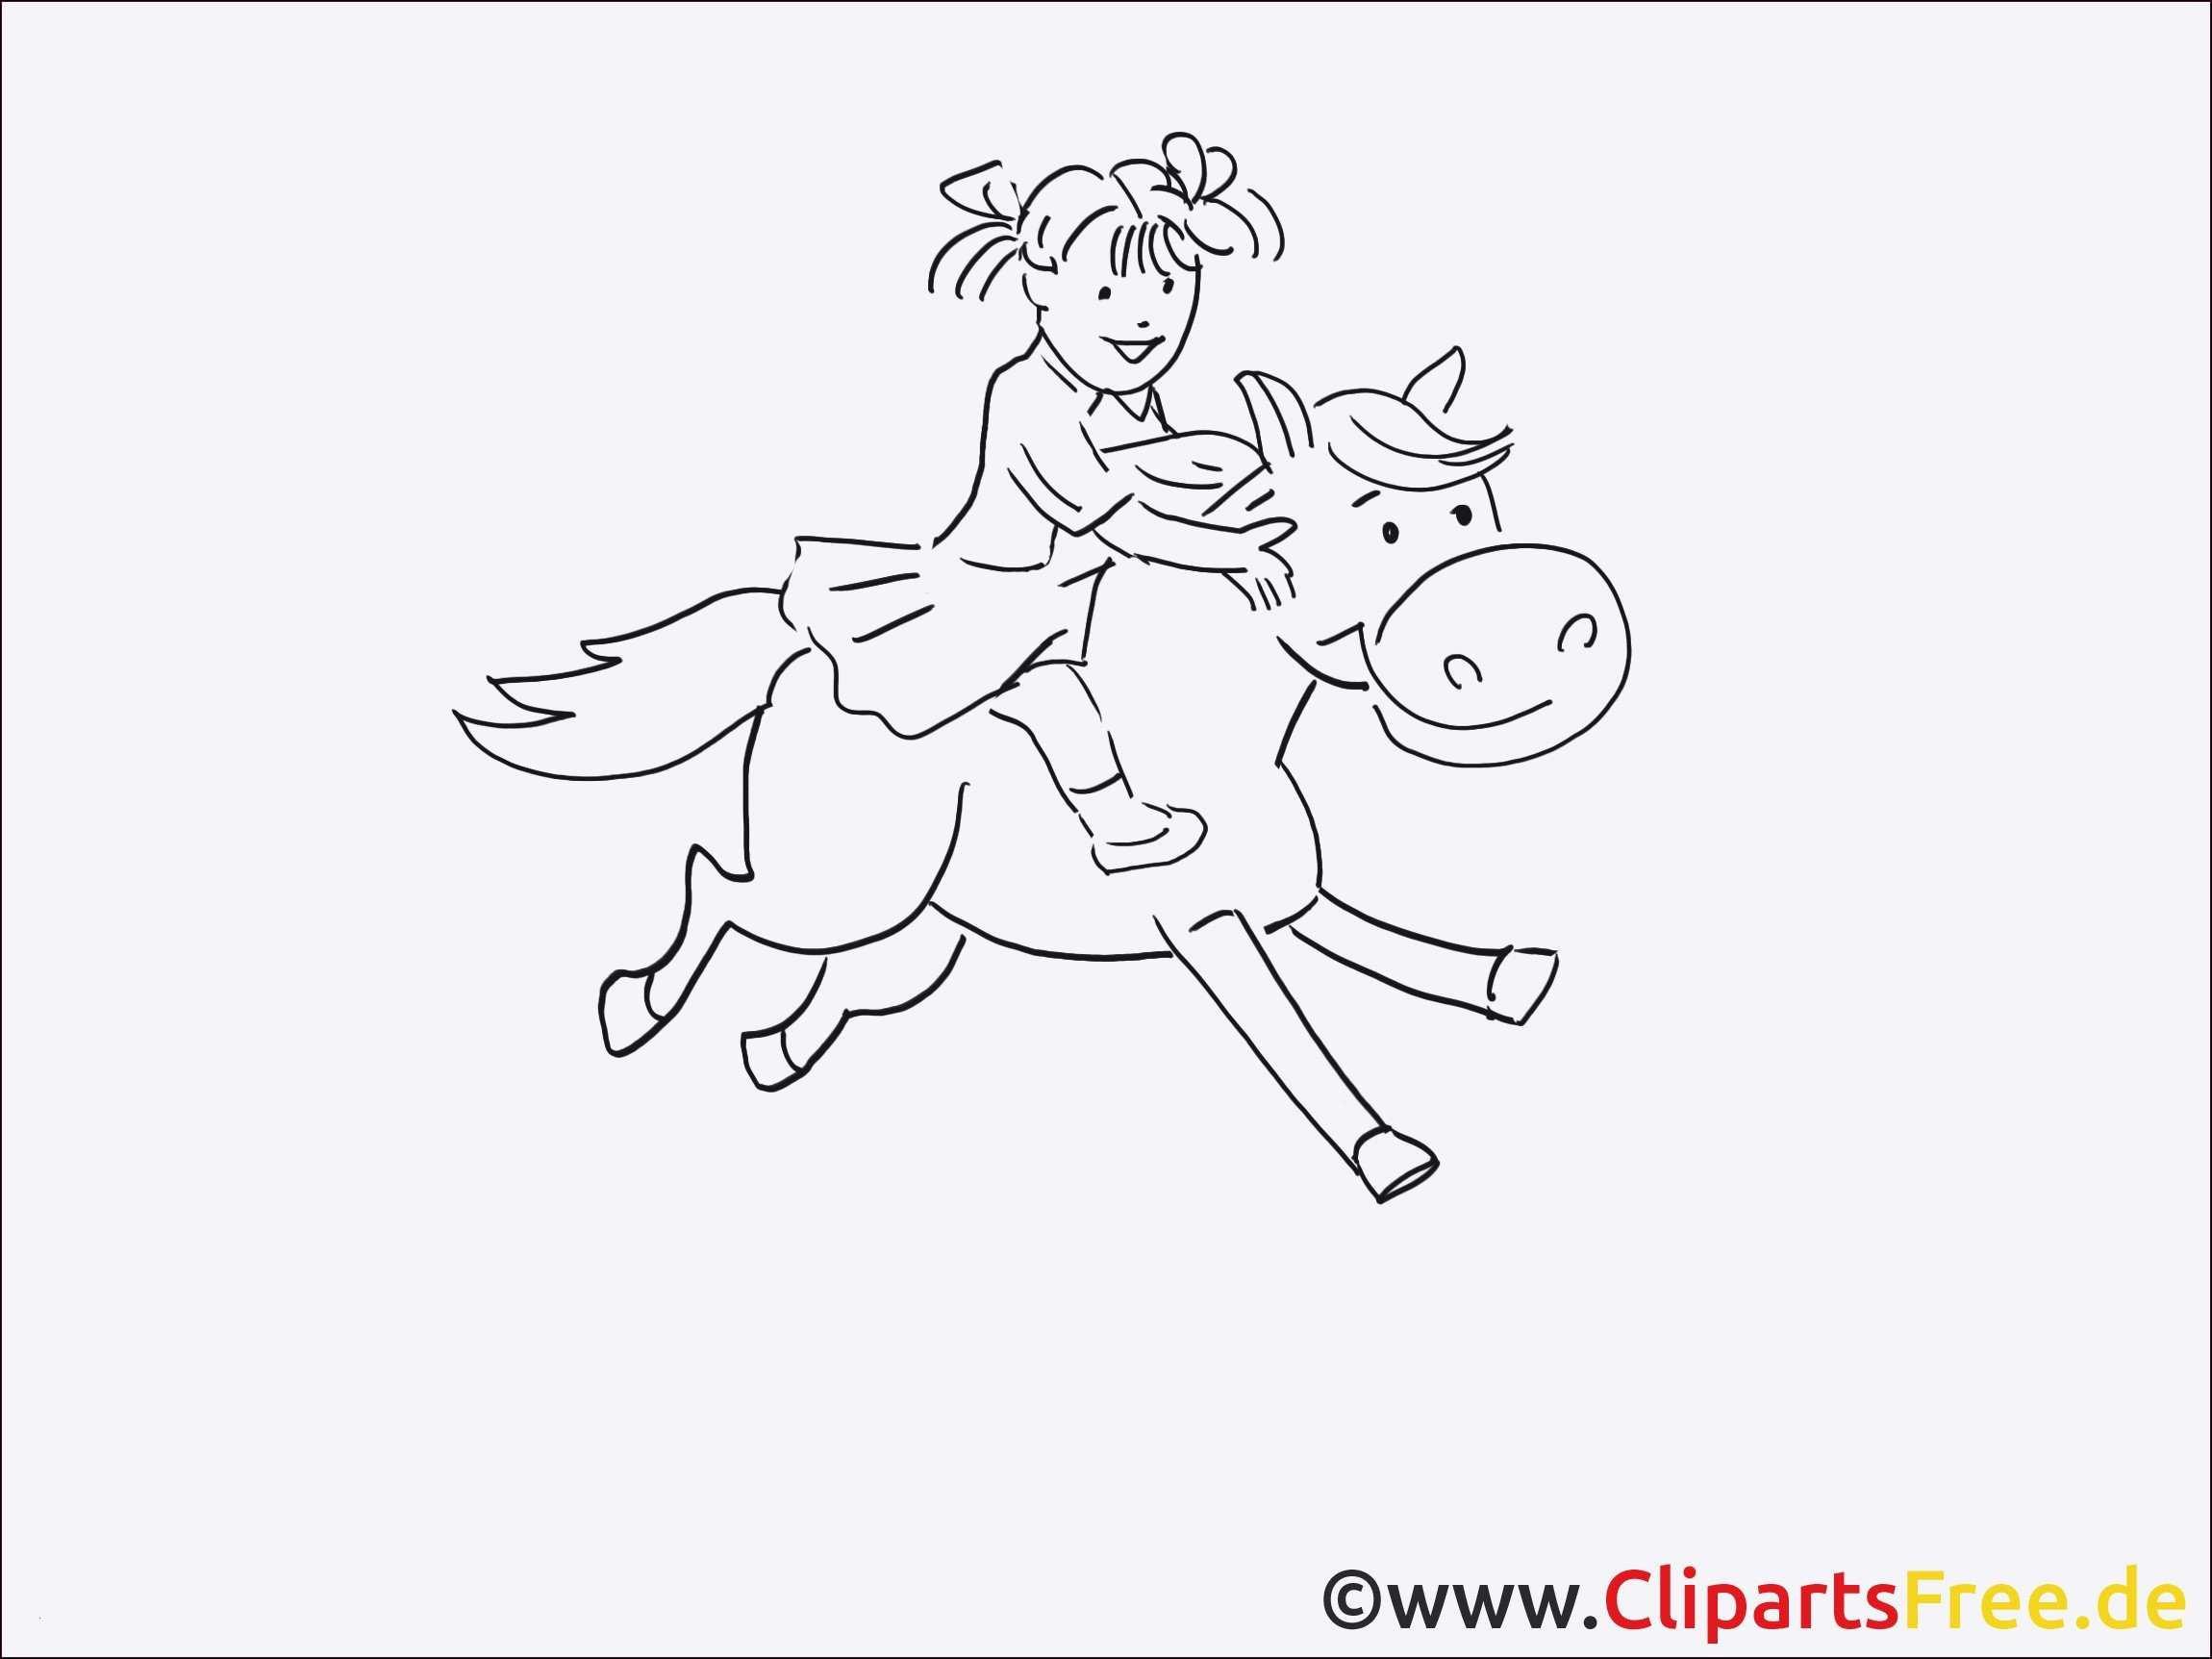 Ninjago Lloyd Ausmalbild Neu Ausmalbilder Ninjago Lloyd Bildnis Ausmalbilder Pferde Mit Madchen Das Bild